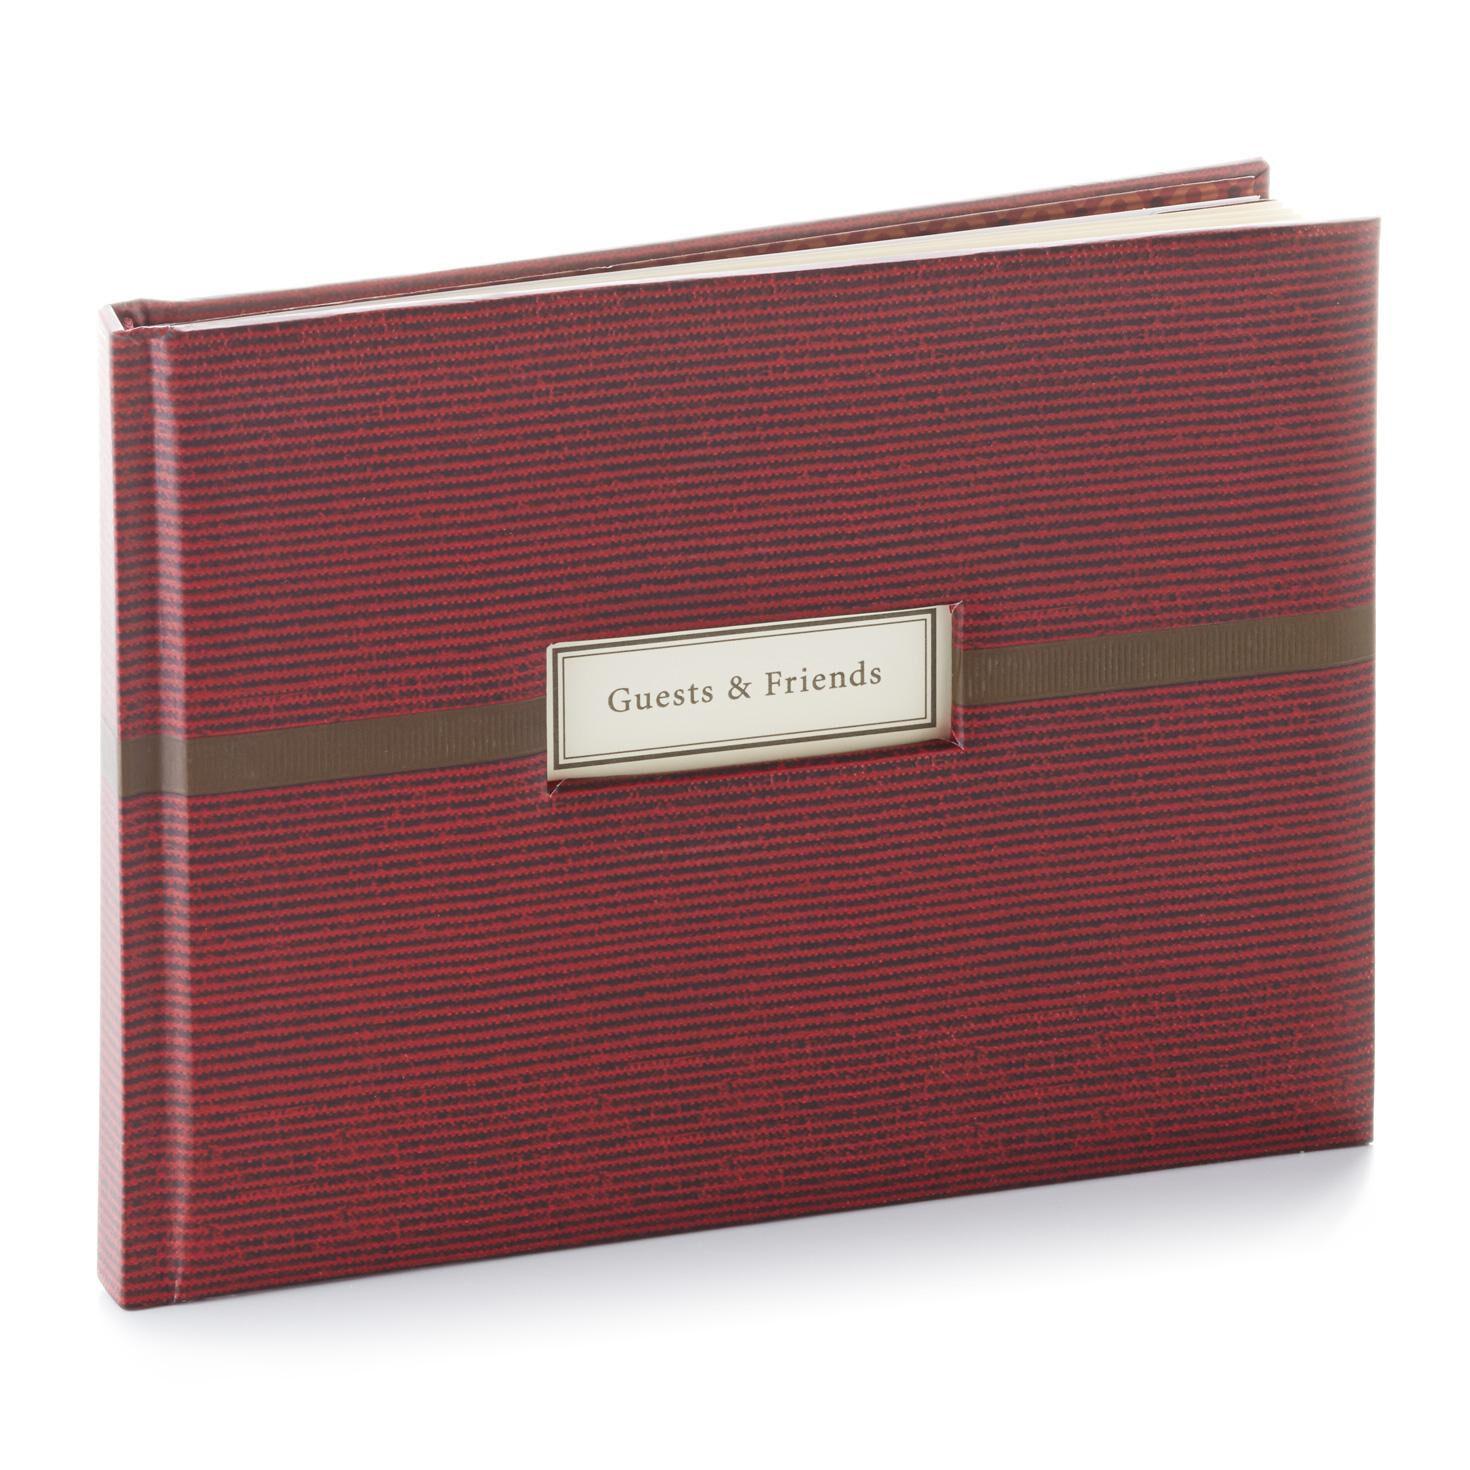 Deluxe Guest Book